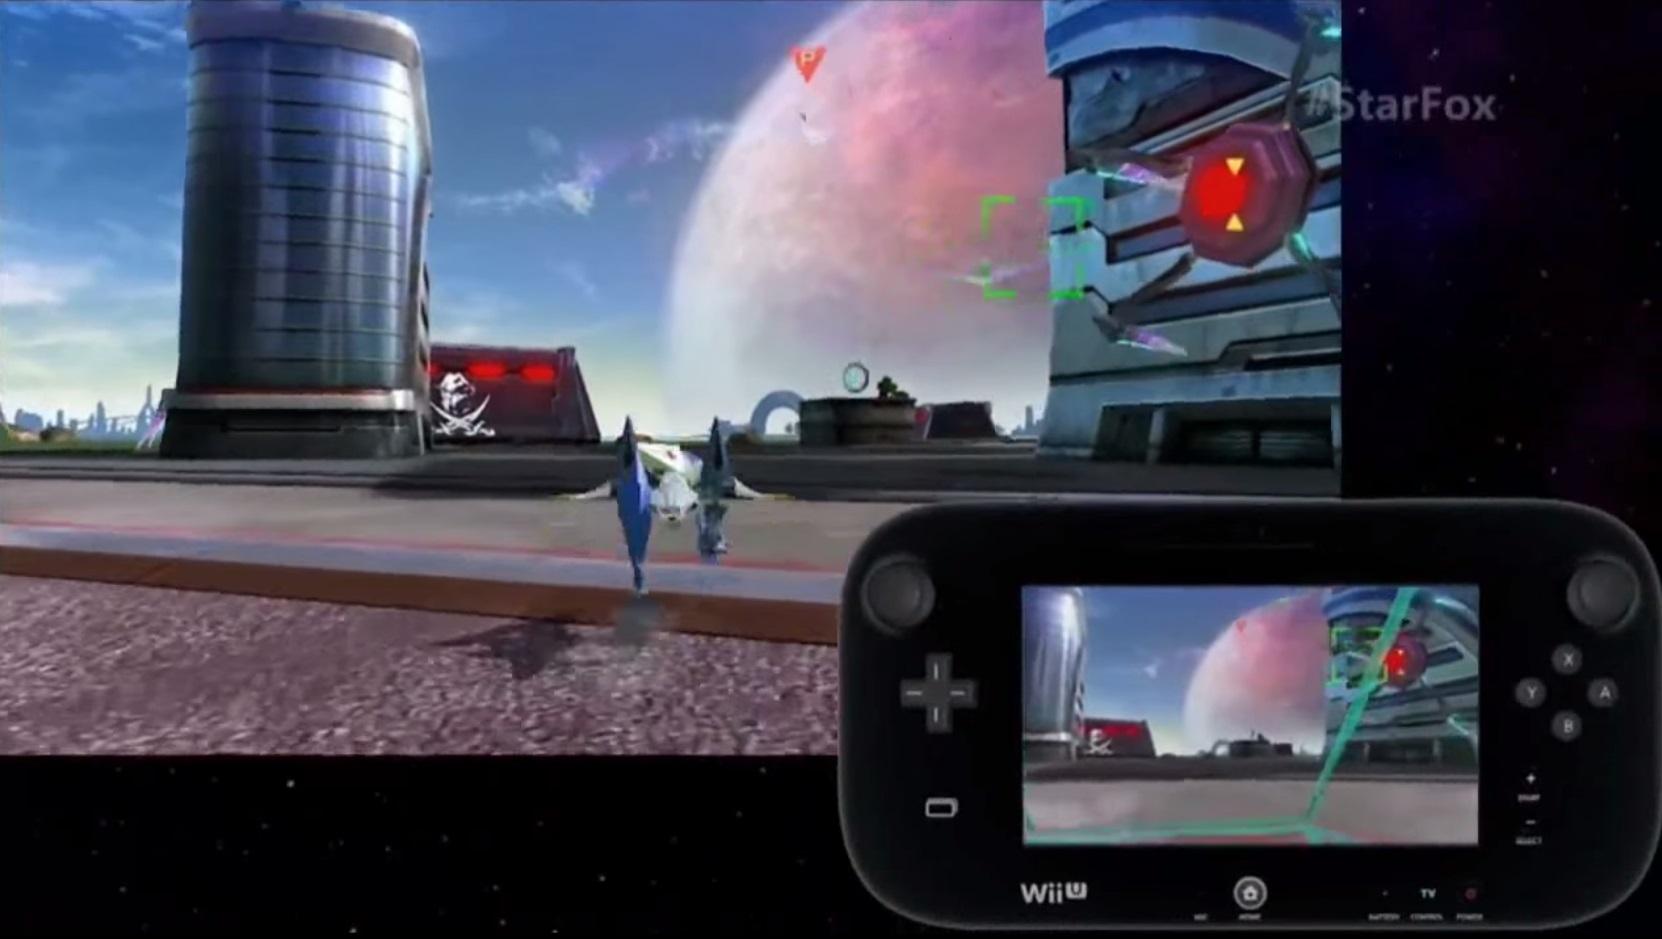 Star Fox Zero Wii U GamePlay Screenshot GamePad Cockpit View Walker